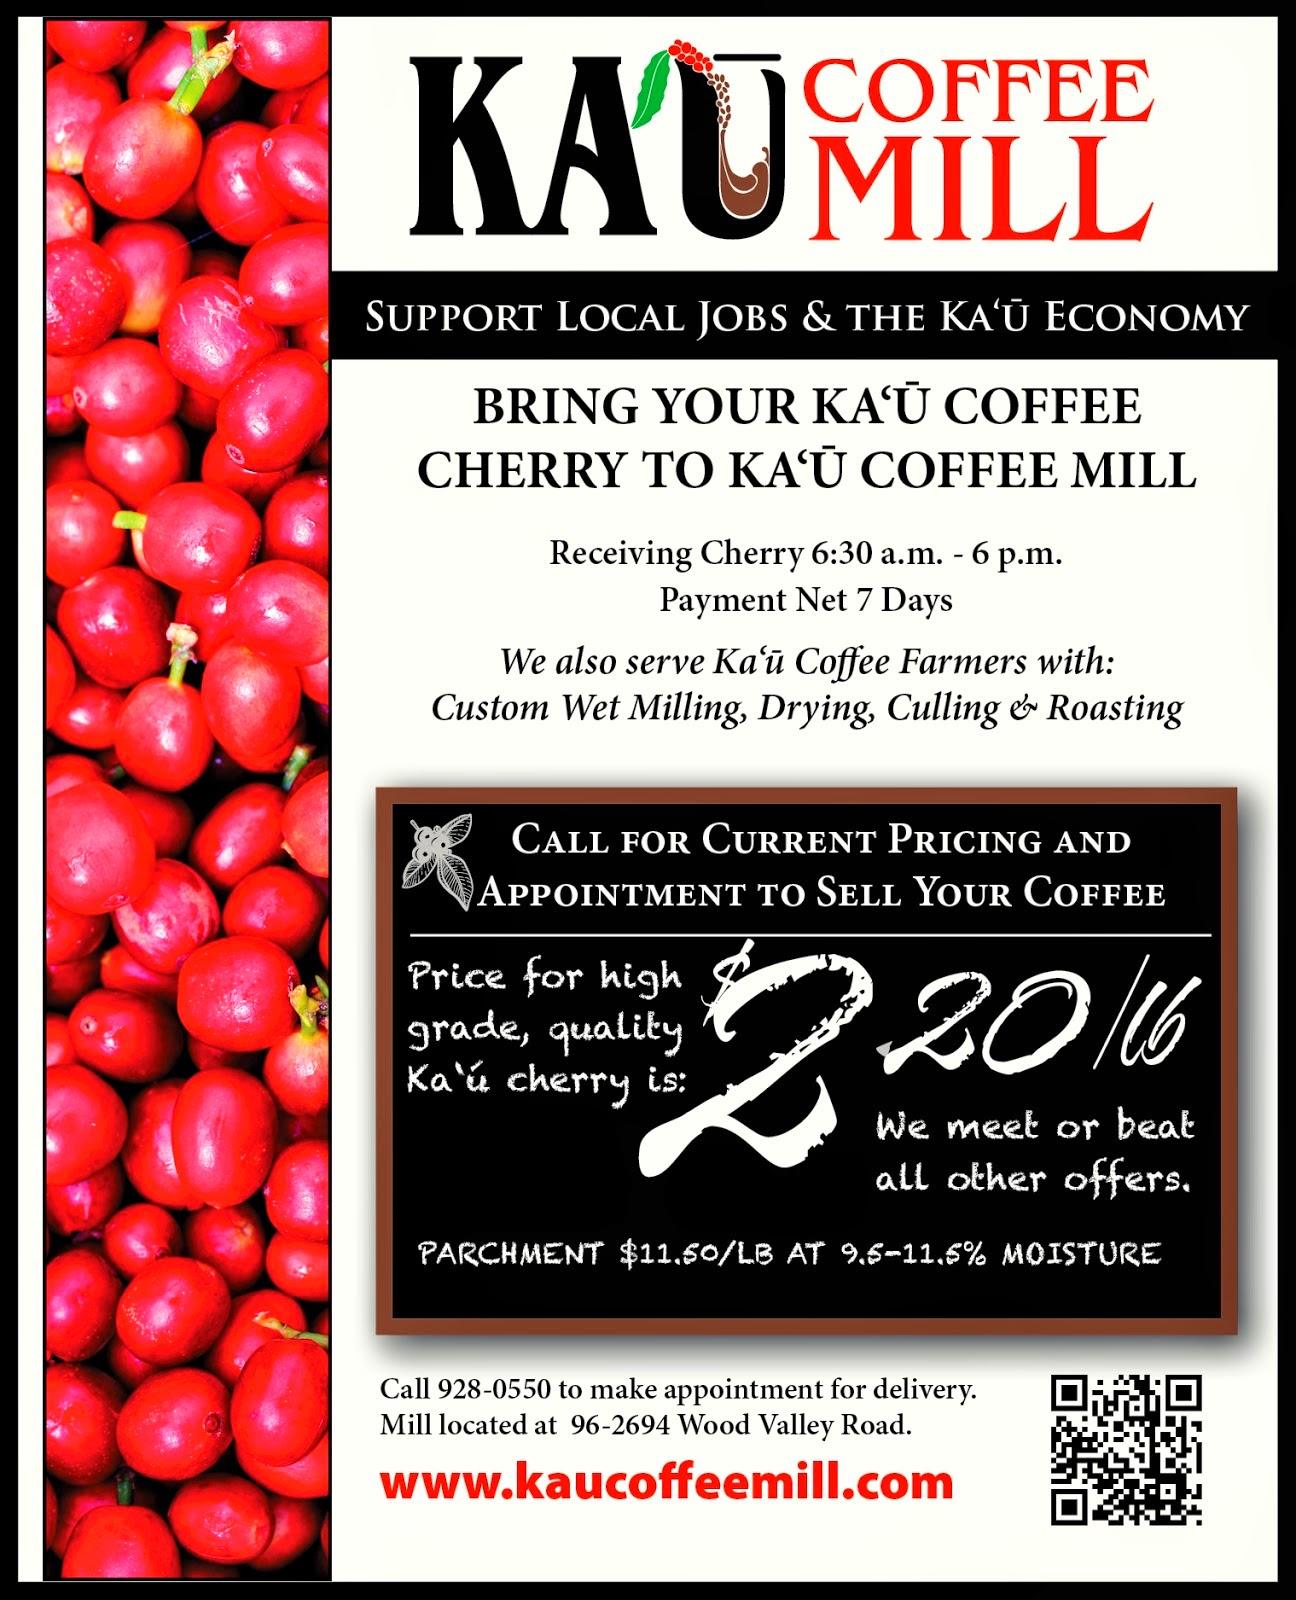 the ka calendar news briefs hawai i island support our sponsors at pahalaplantationcottages com and kaucoffeemill com ka`u coffee mill is open seven days a week